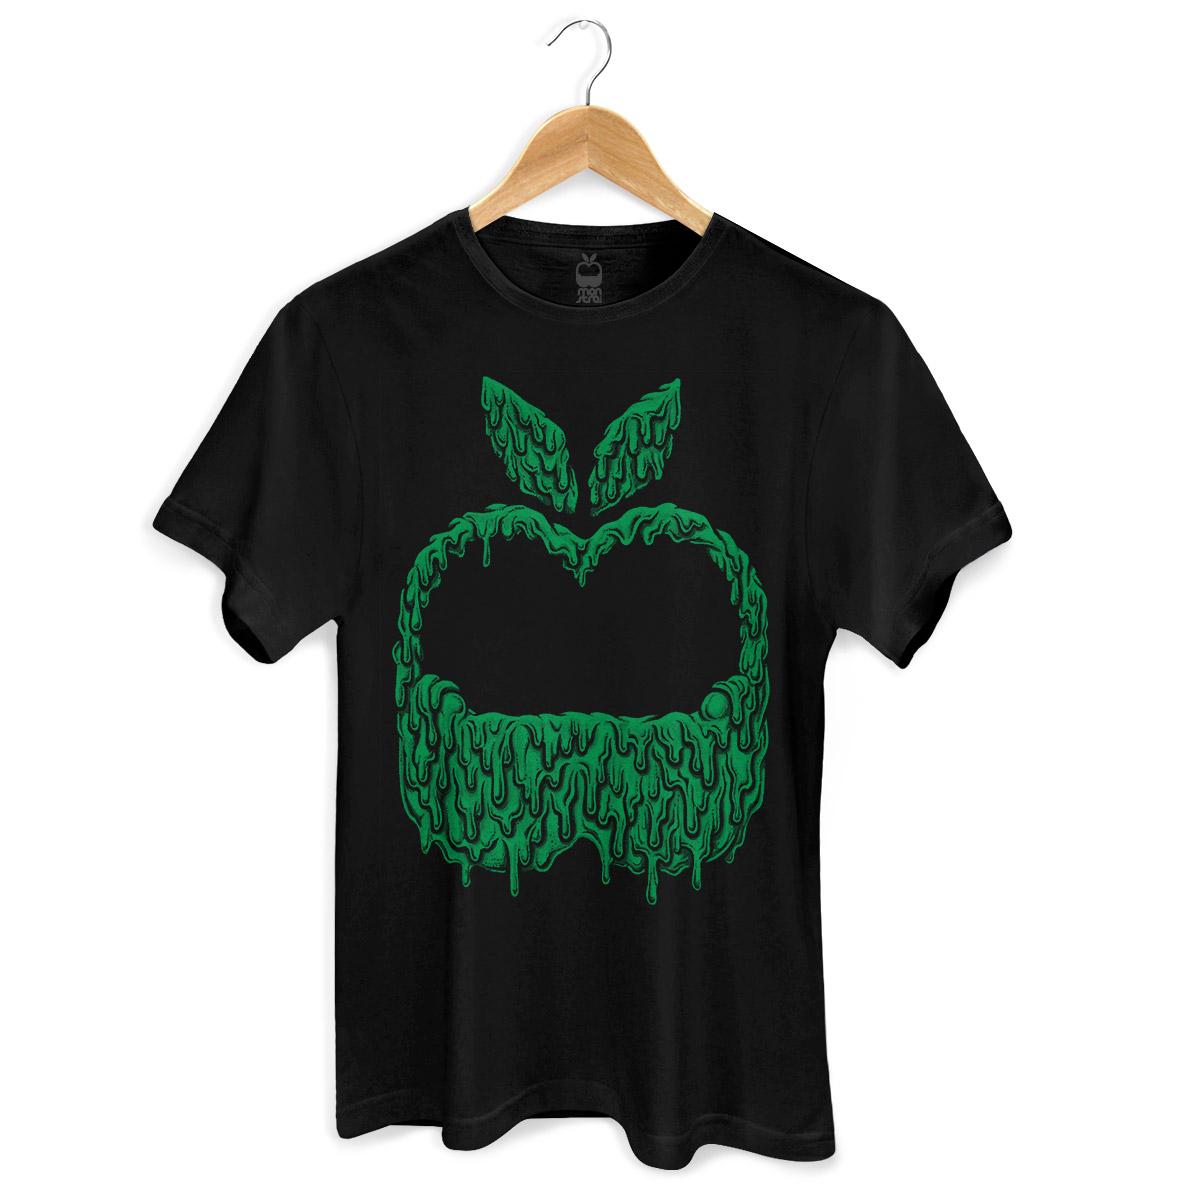 Camiseta Masculina Monstra Maçã Slime